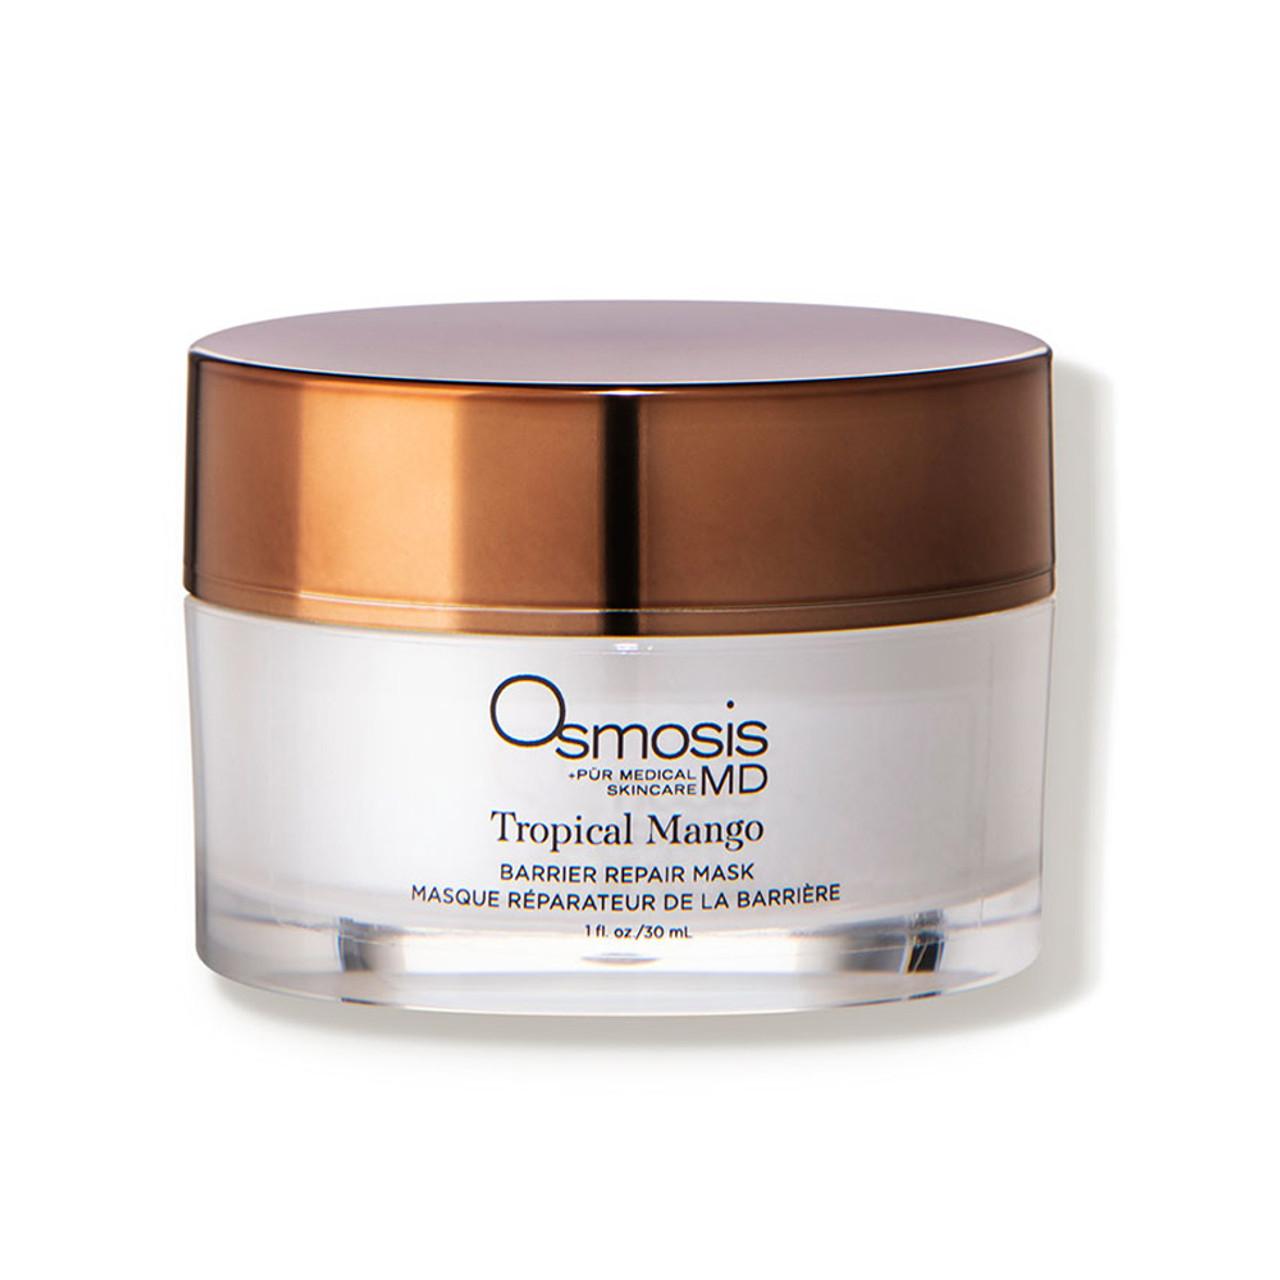 Osmosis +Skincare MD Tropical Mango - Barrier Repair Mask BeautifiedYou.com